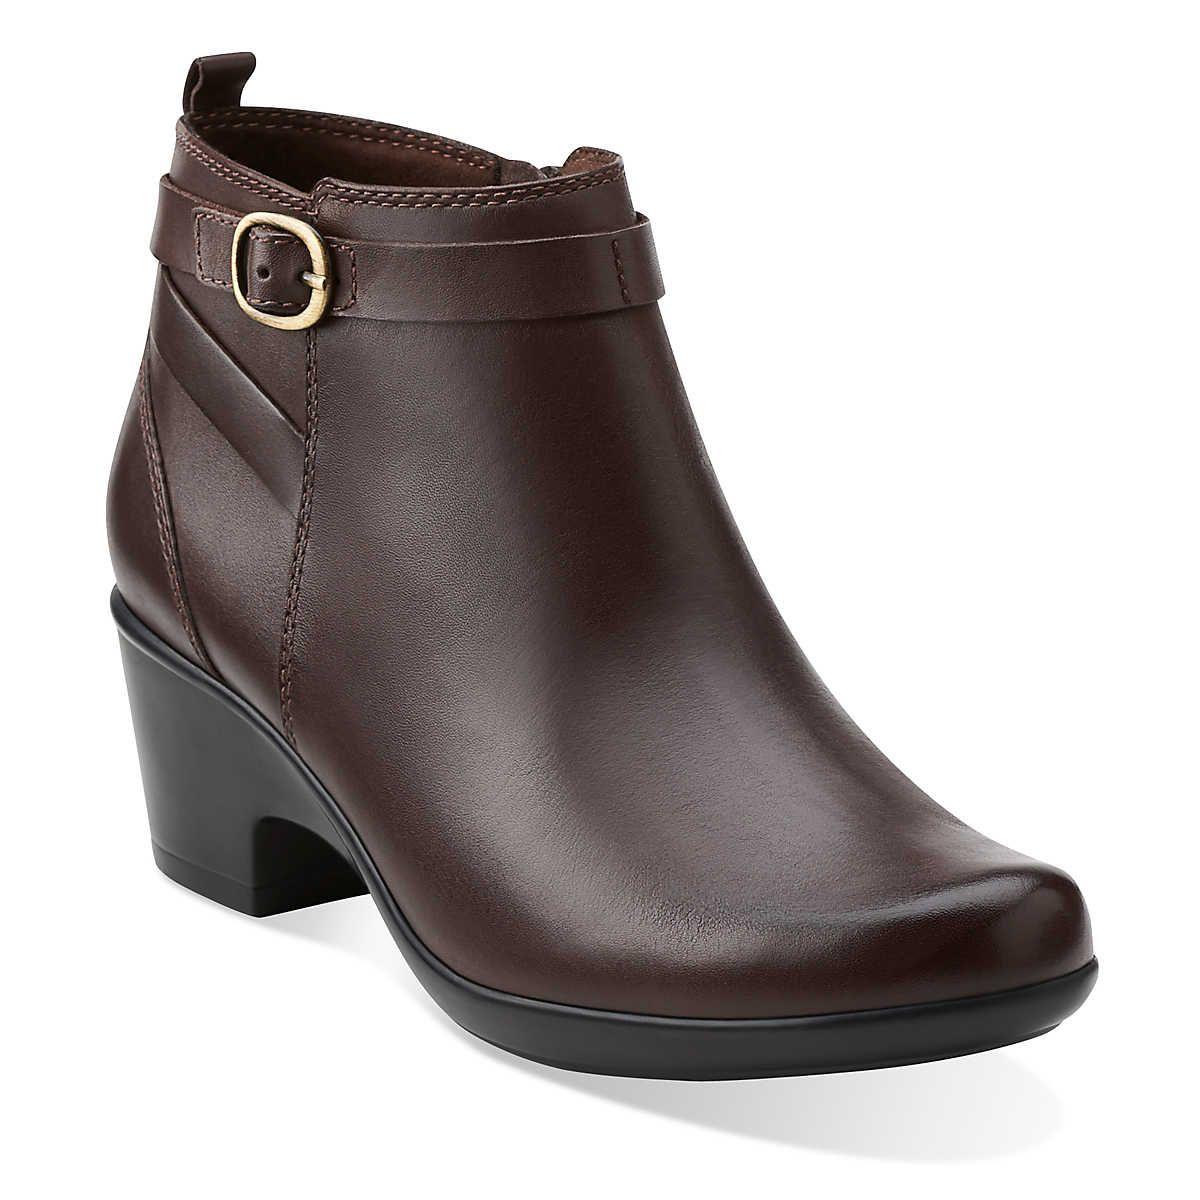 Womens Boots Clarks Malia Hawthorn Black Leather